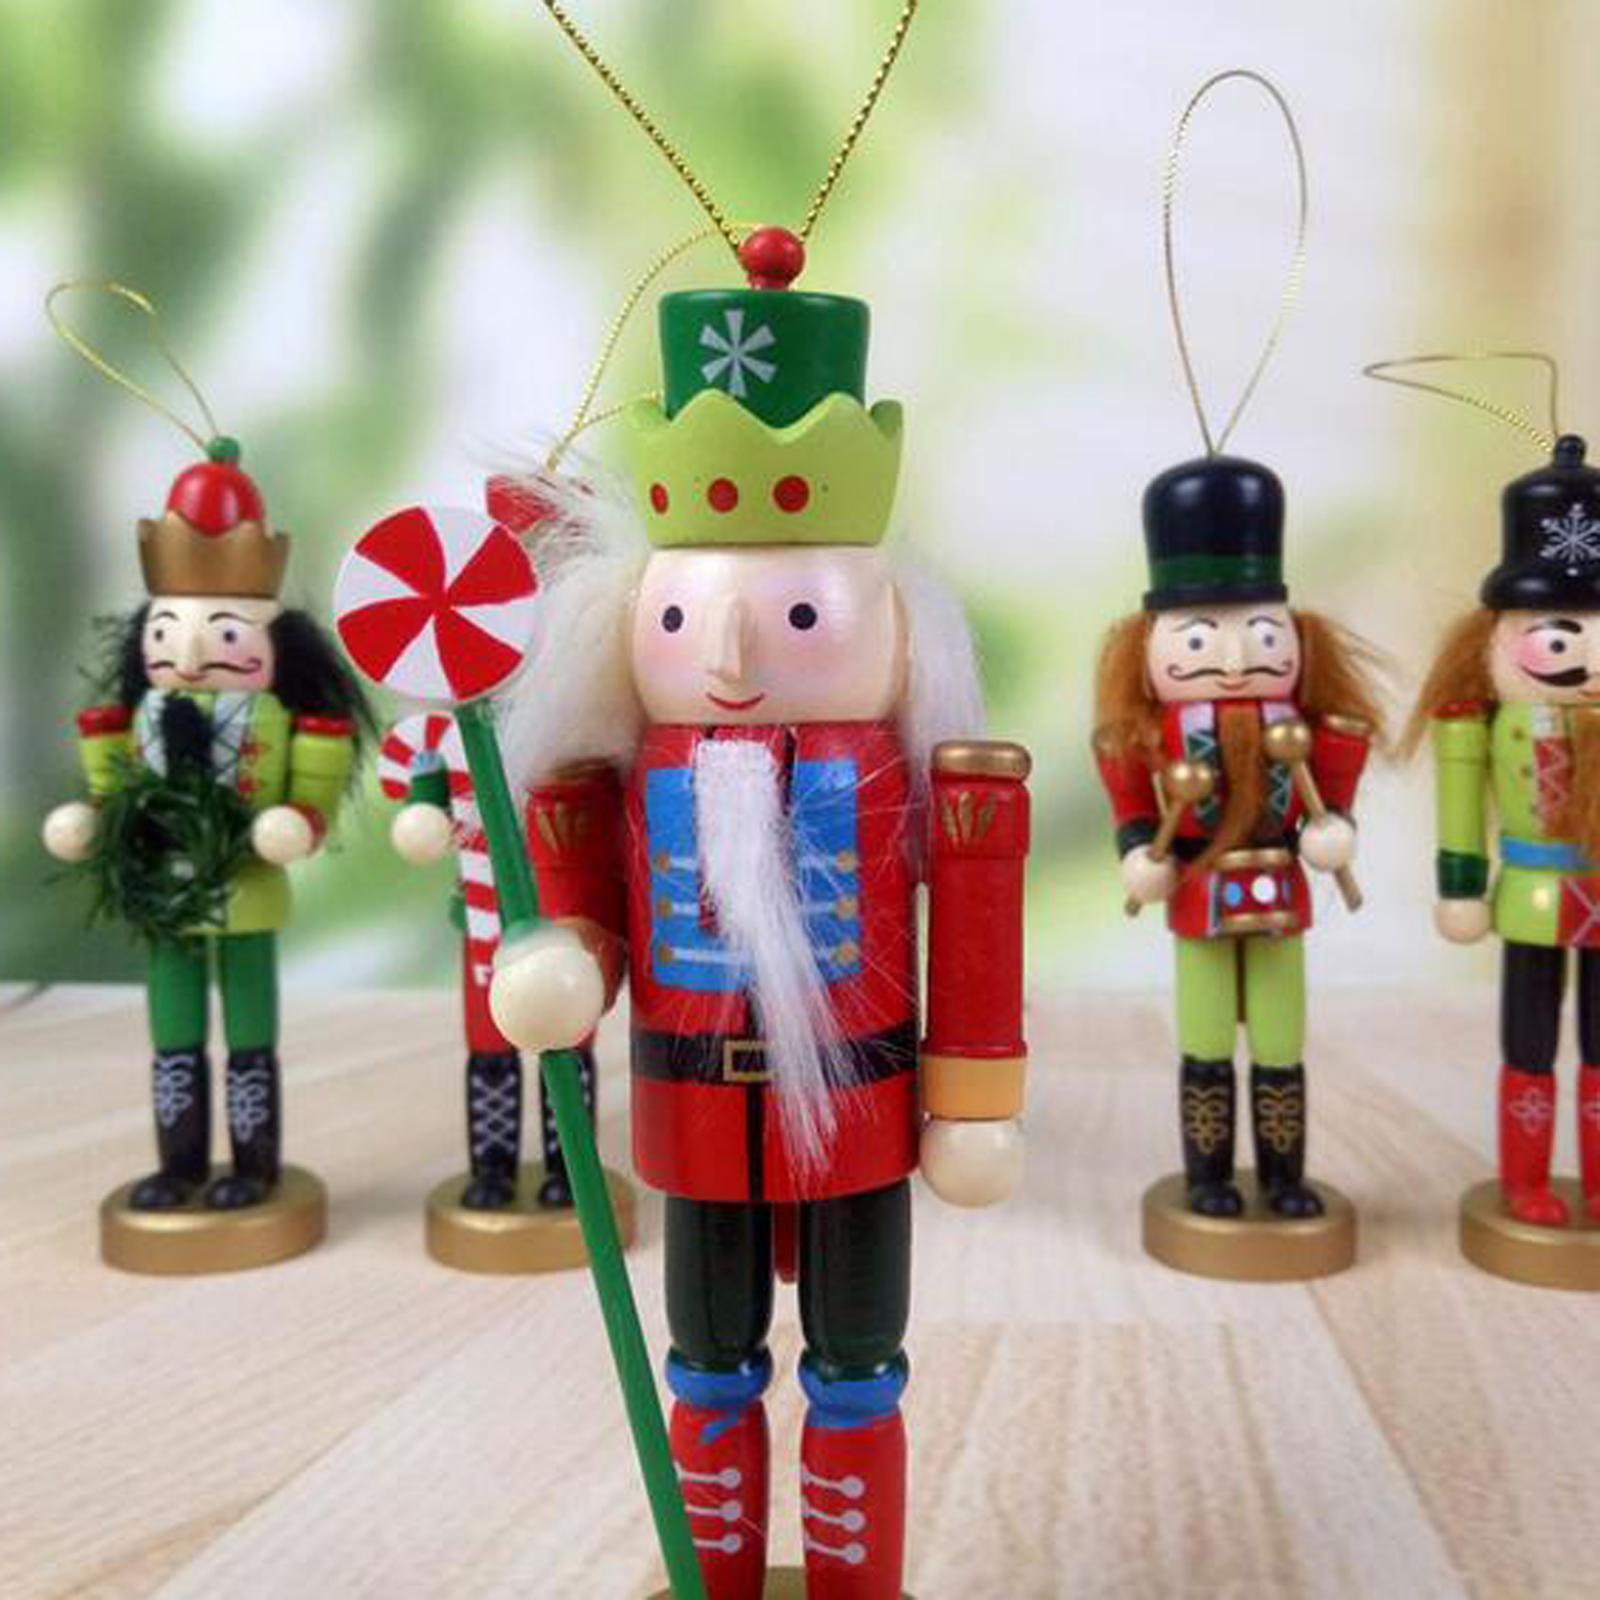 5X Nutcracker Soldier 12.5CM Wooden Craft Walnut Puppet Christmas Tree Ornament